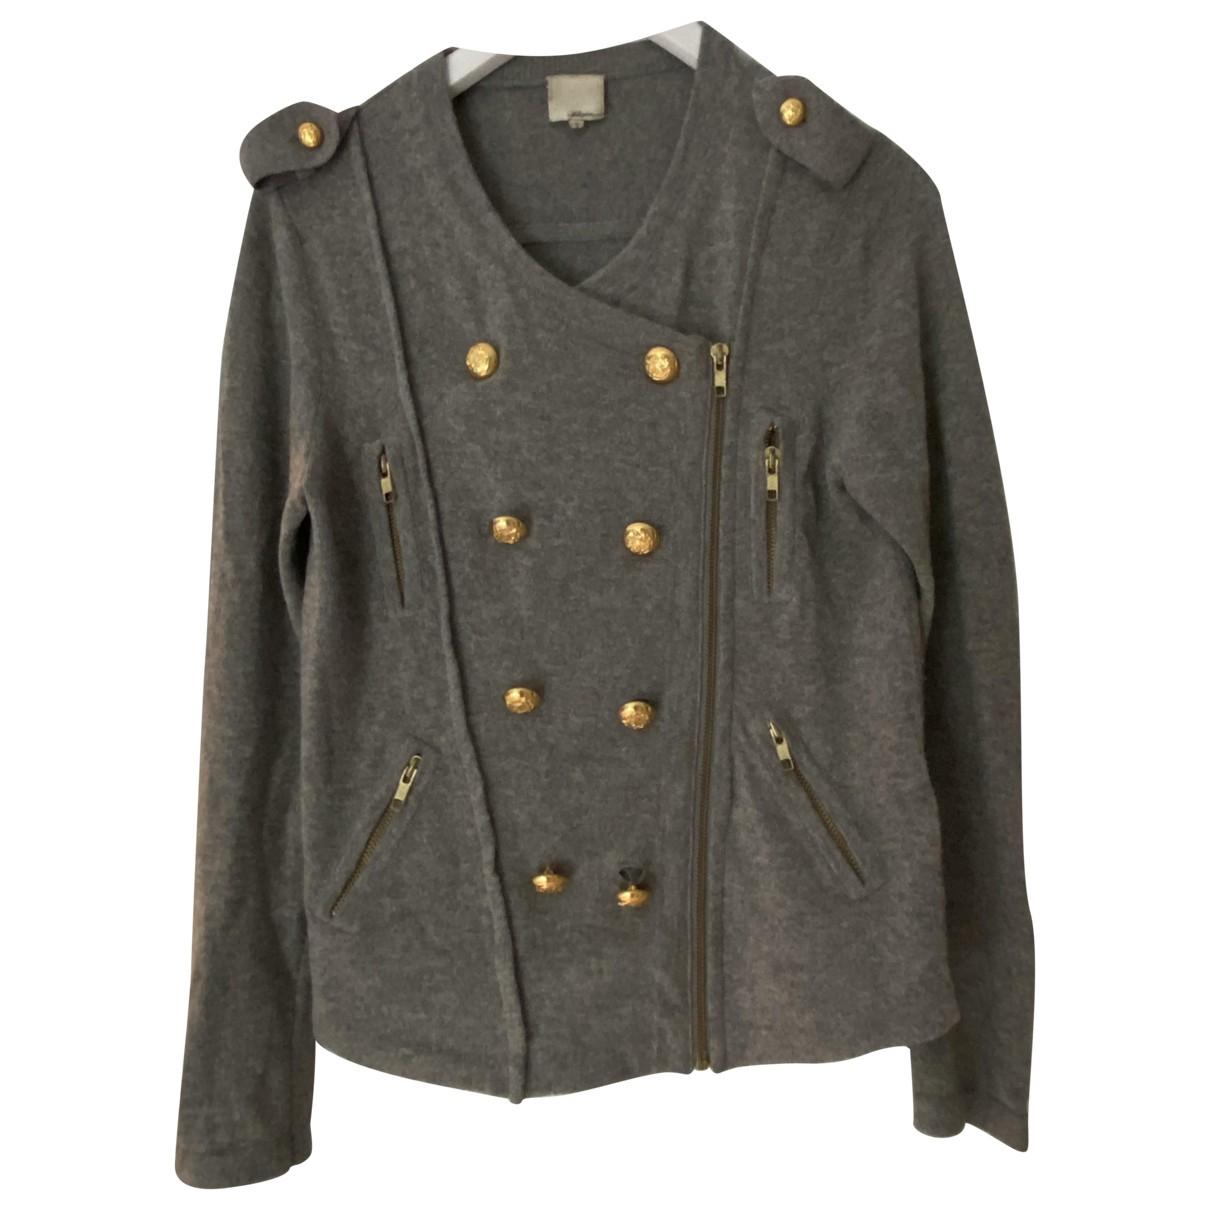 3.1 Phillip Lim \N Grey Cashmere Knitwear for Women S International